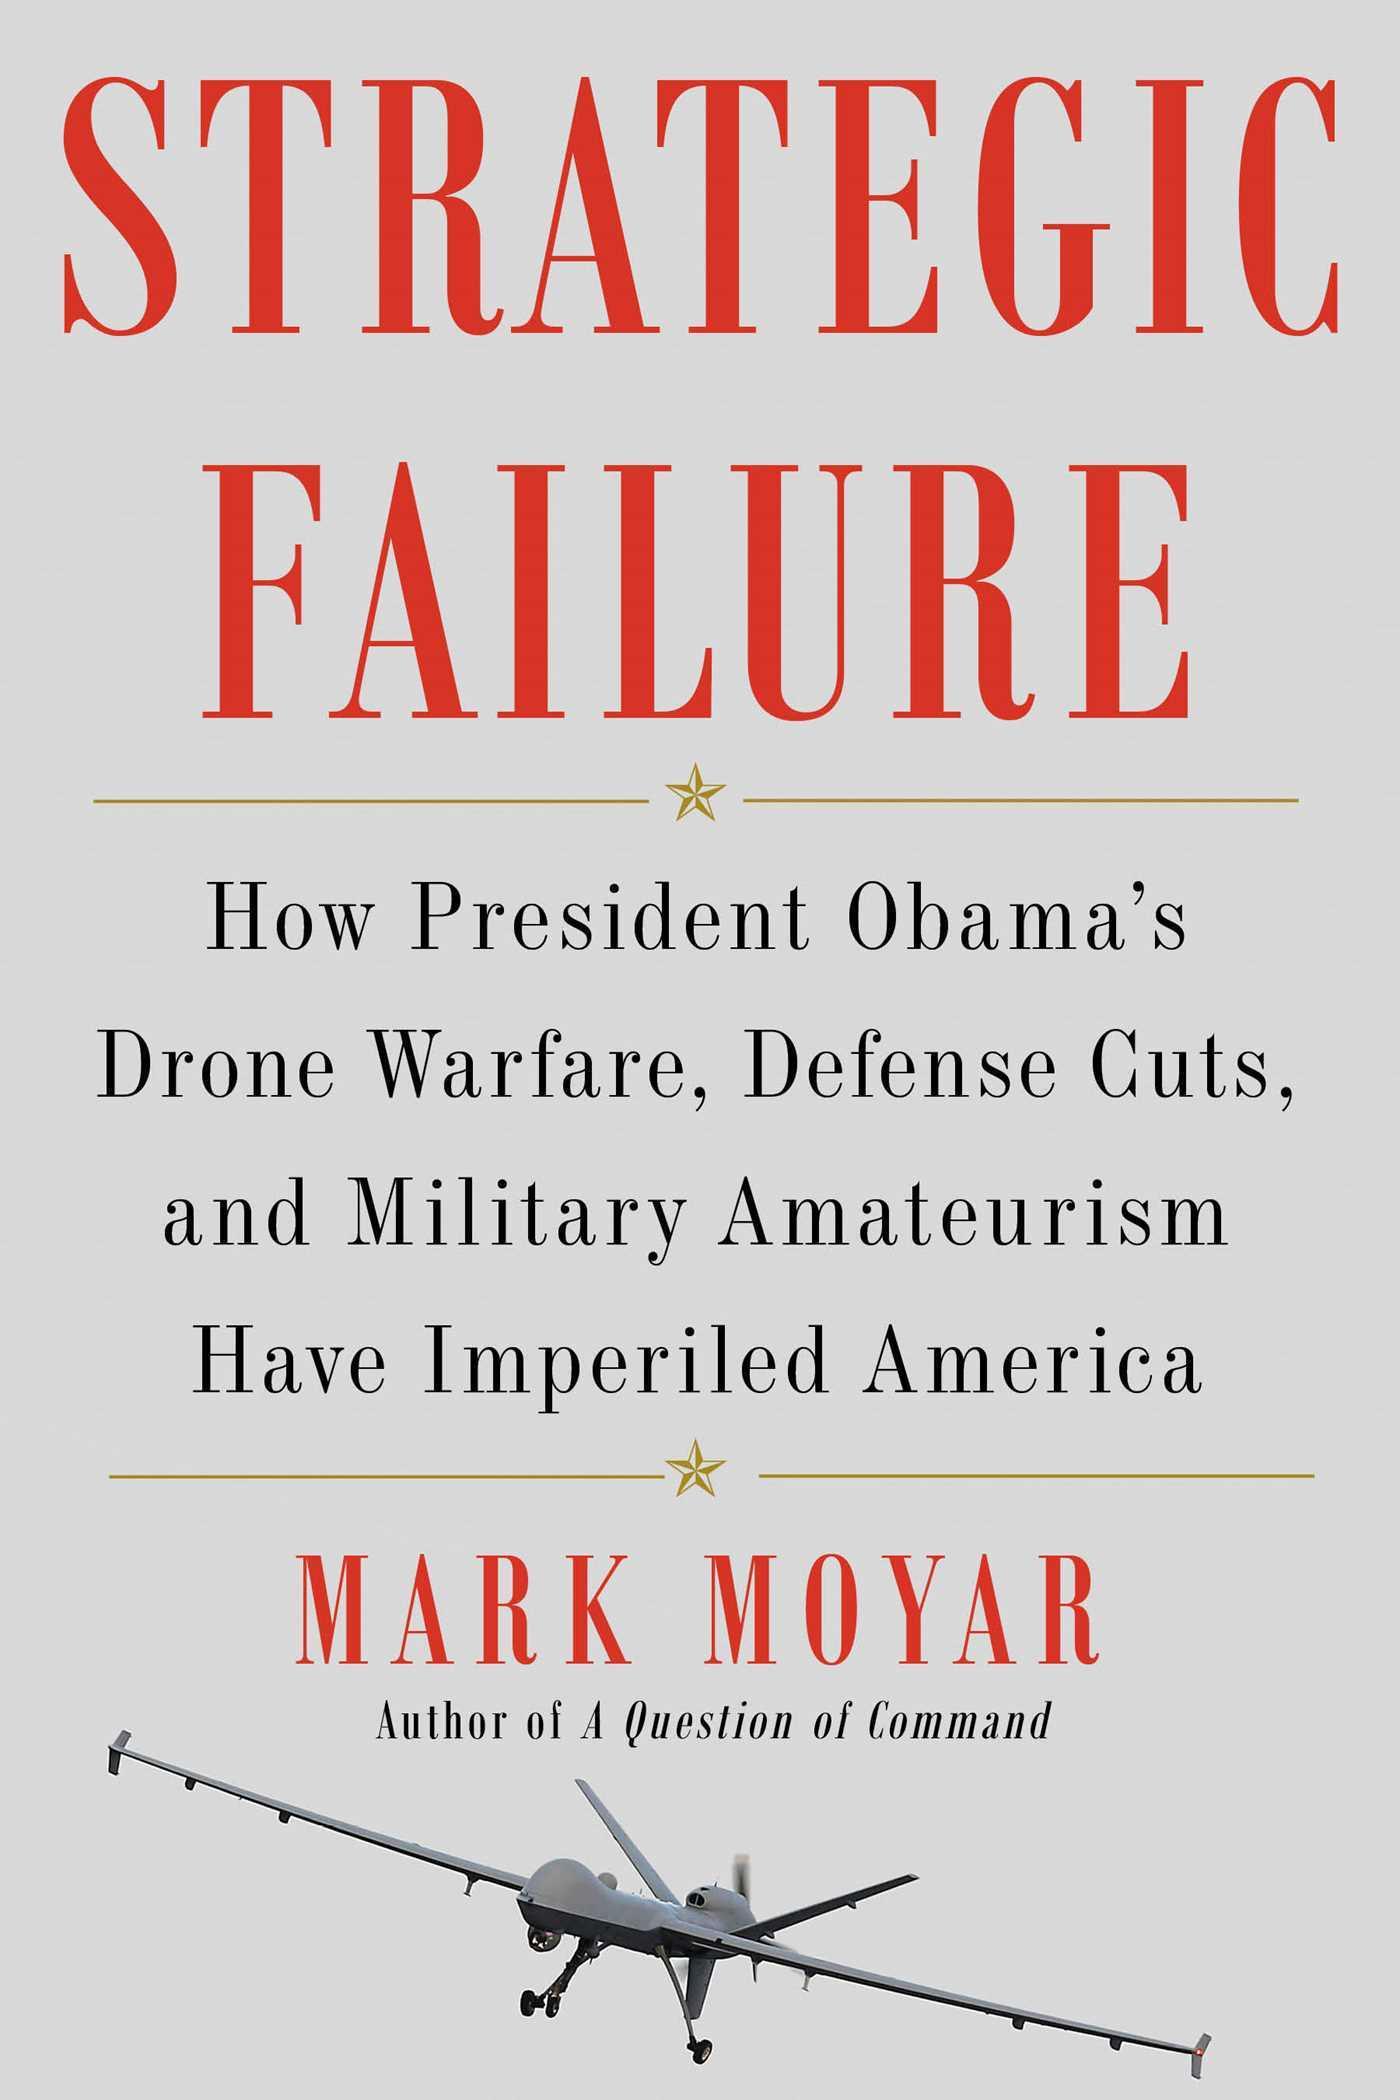 Strategic Failure: How President Obama's Drone Warfare, Defense Cuts, and Military Amateurism Have Imperiled America Mark Moyar